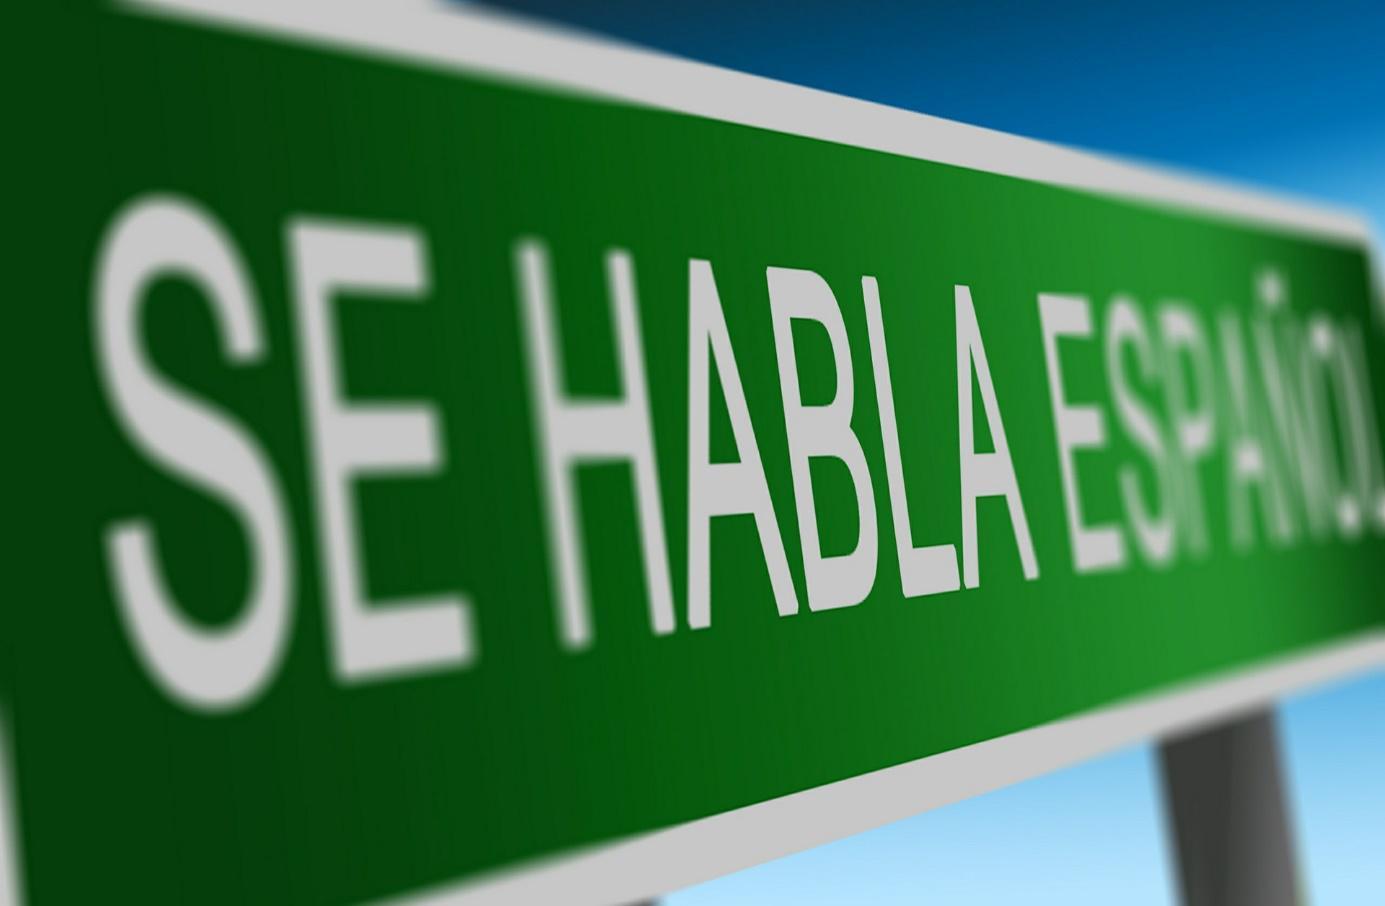 Tablica hiszpańska